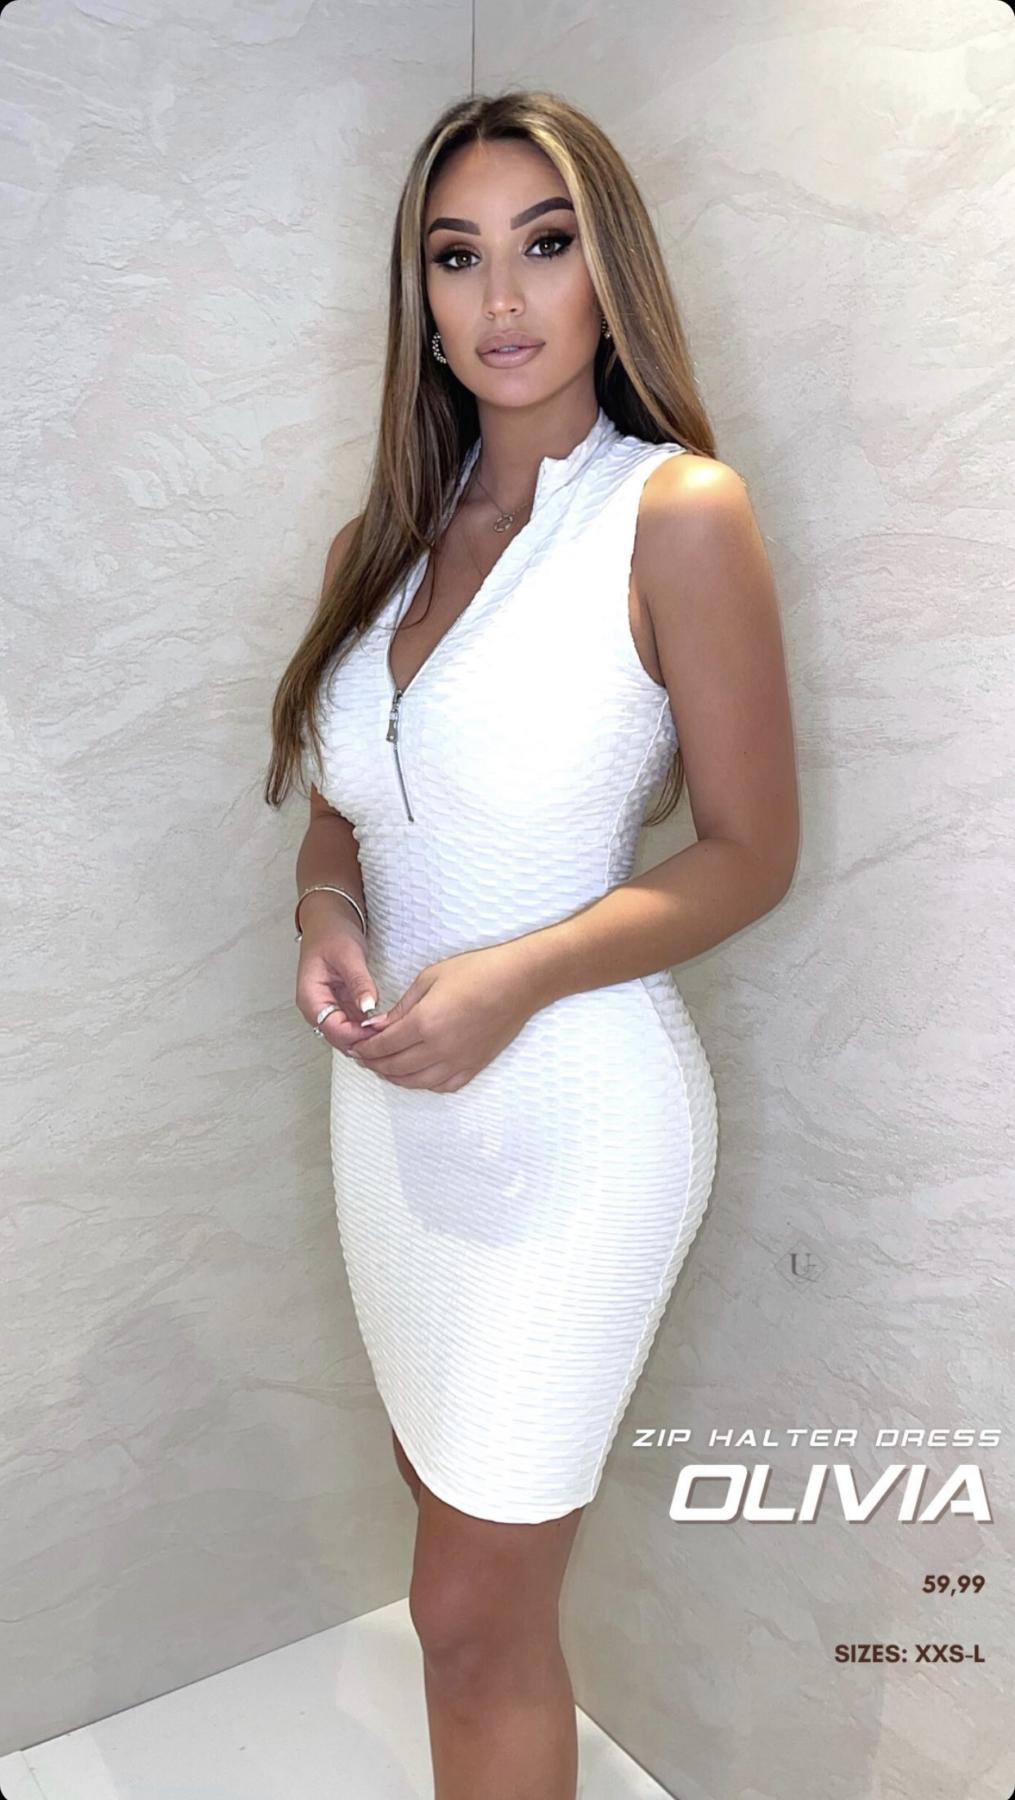 UNIQUE THE LABEL OLIVIA ZIP DRESS – white